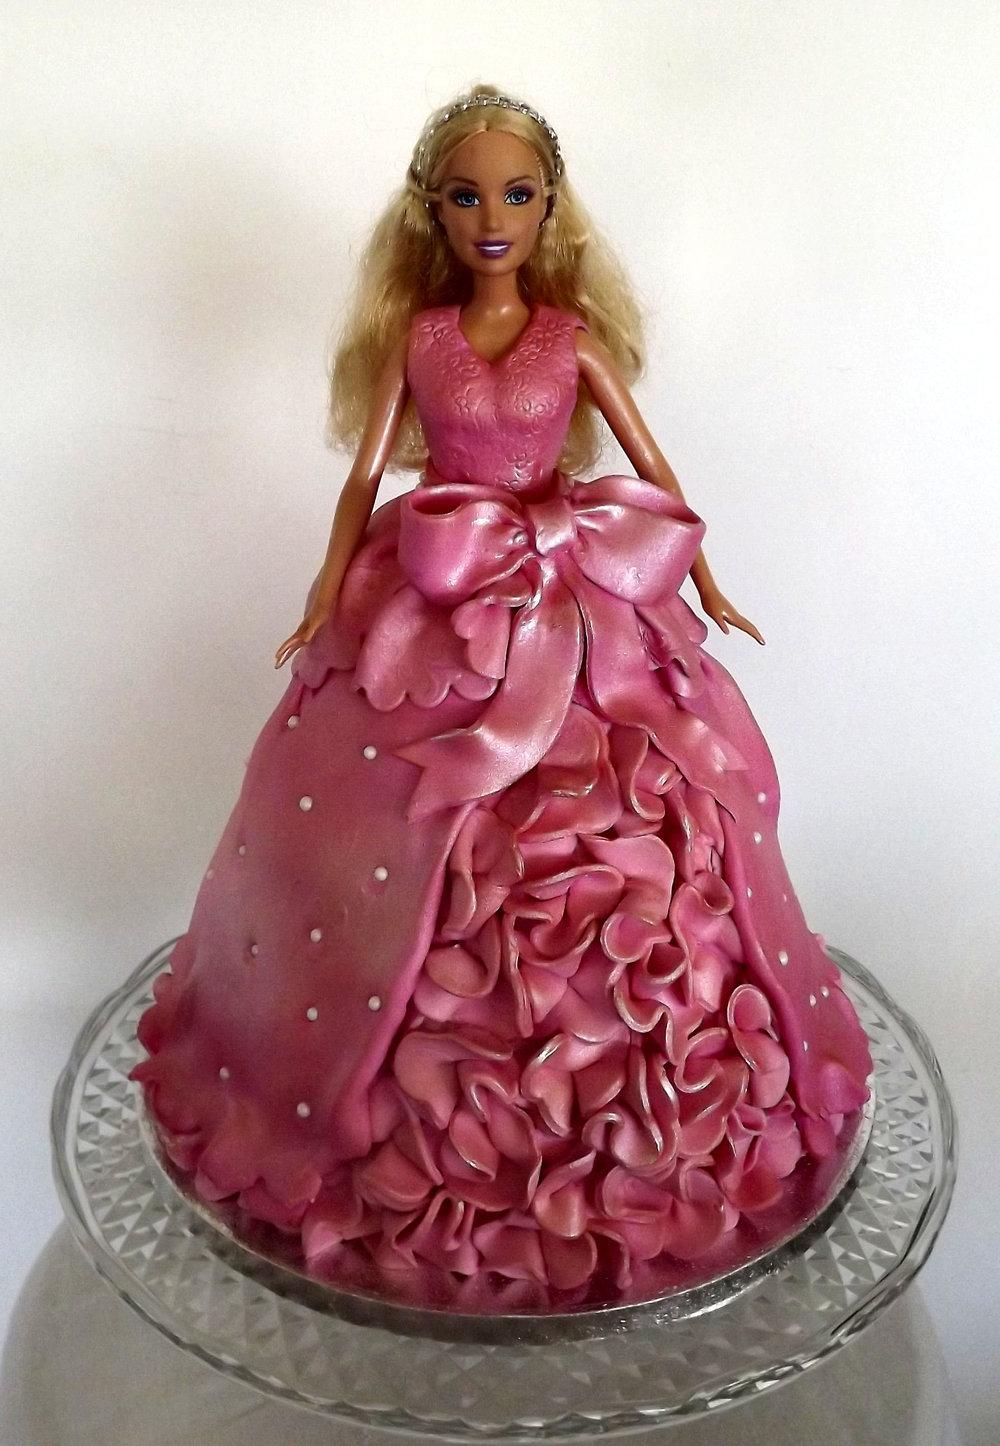 barbie cake.jpg